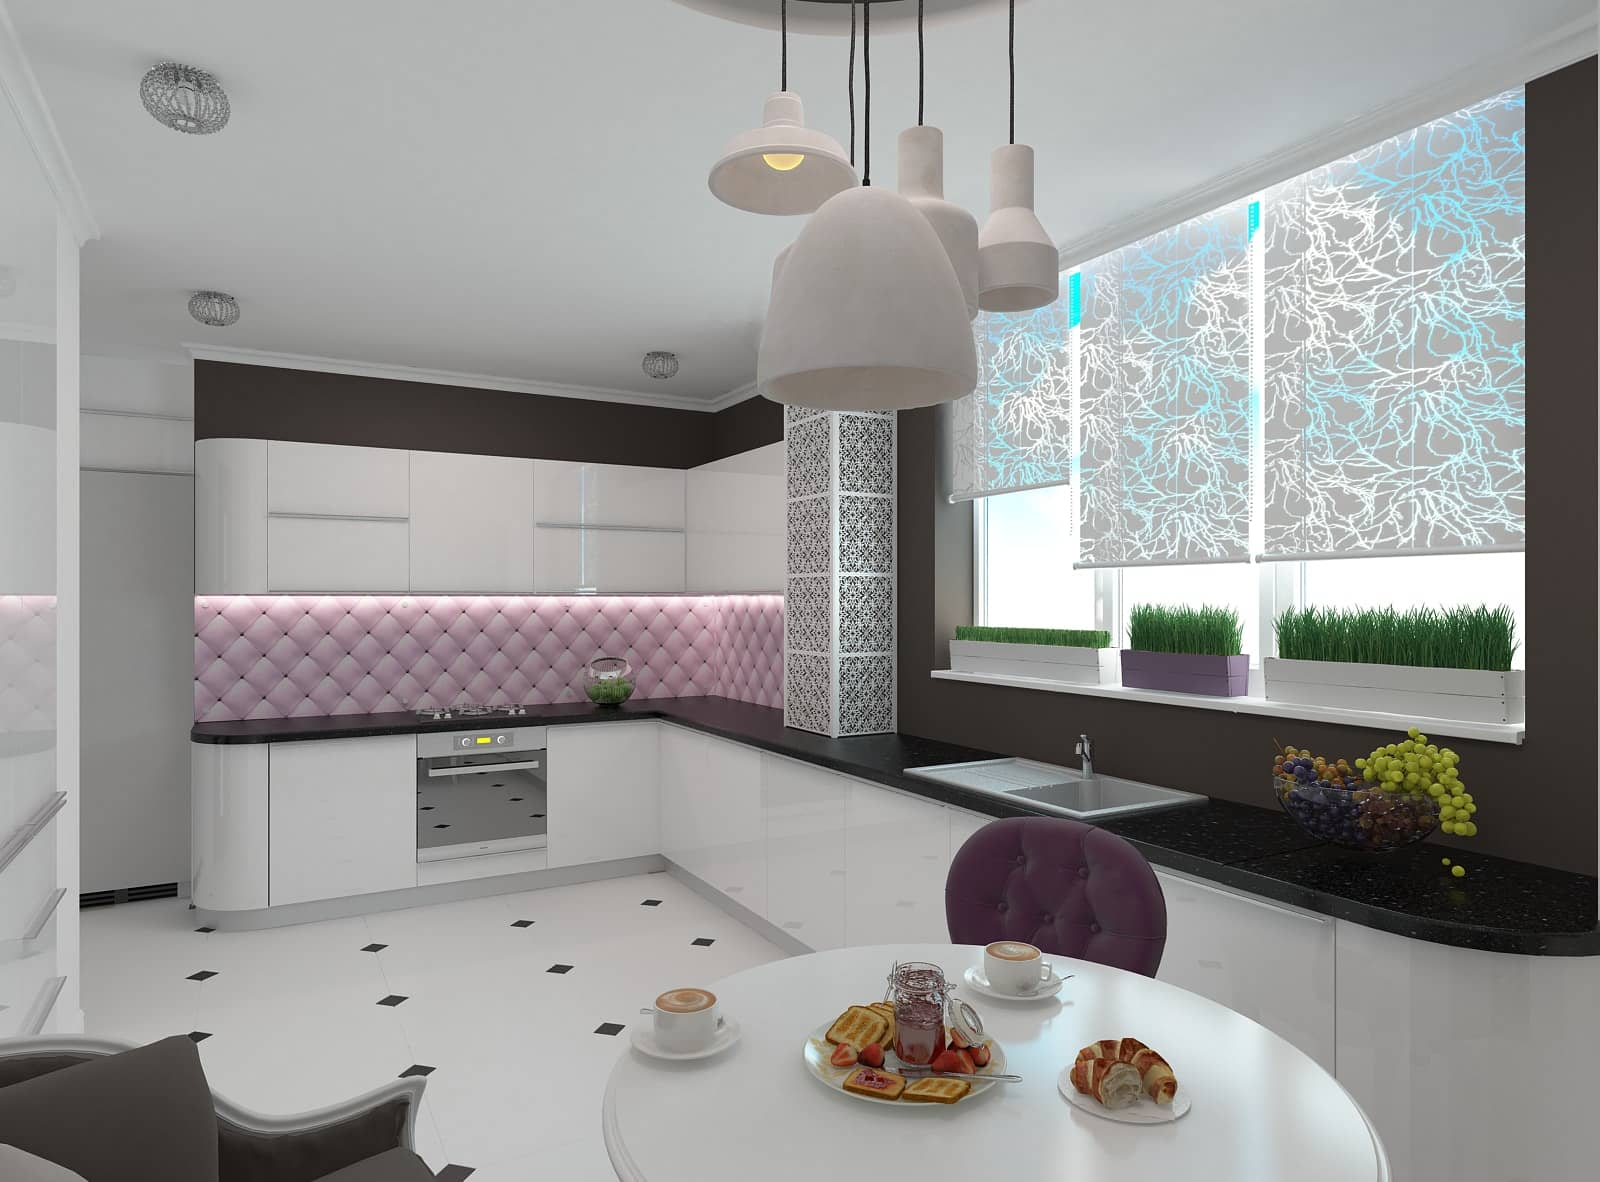 Дизайн кухні-студії: фото 2